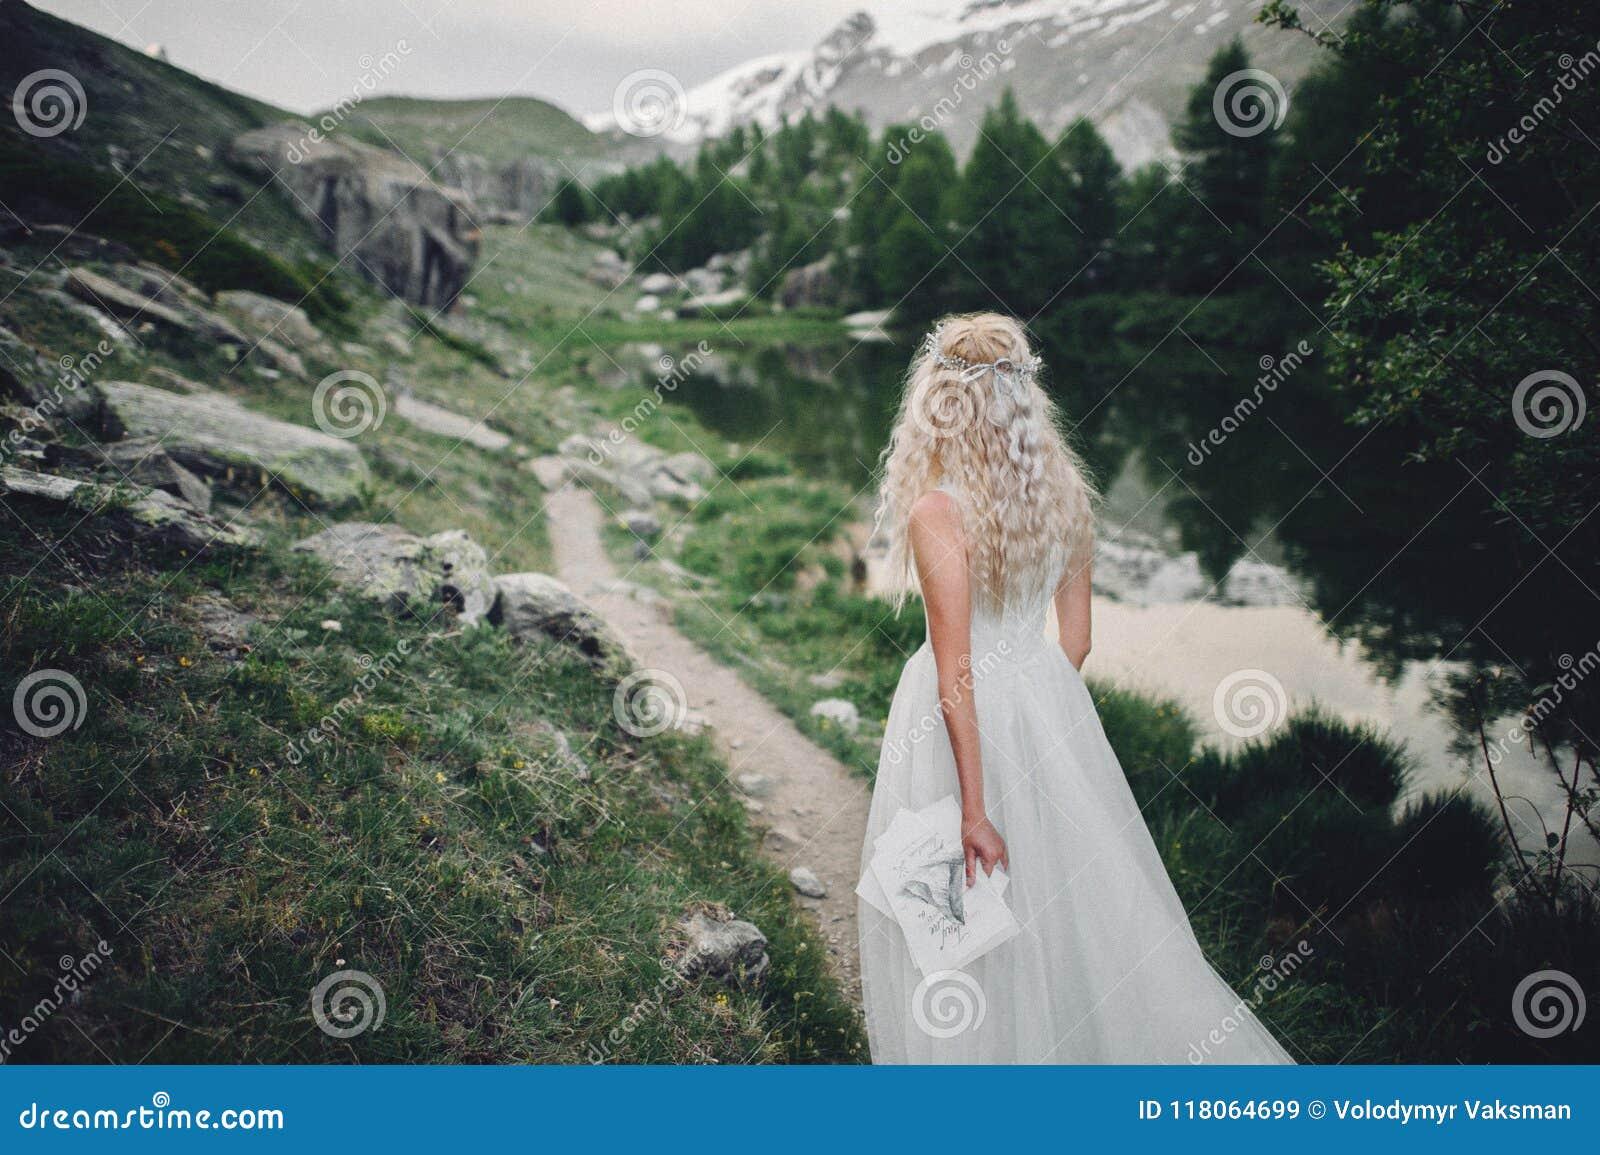 Marriage in switzerland